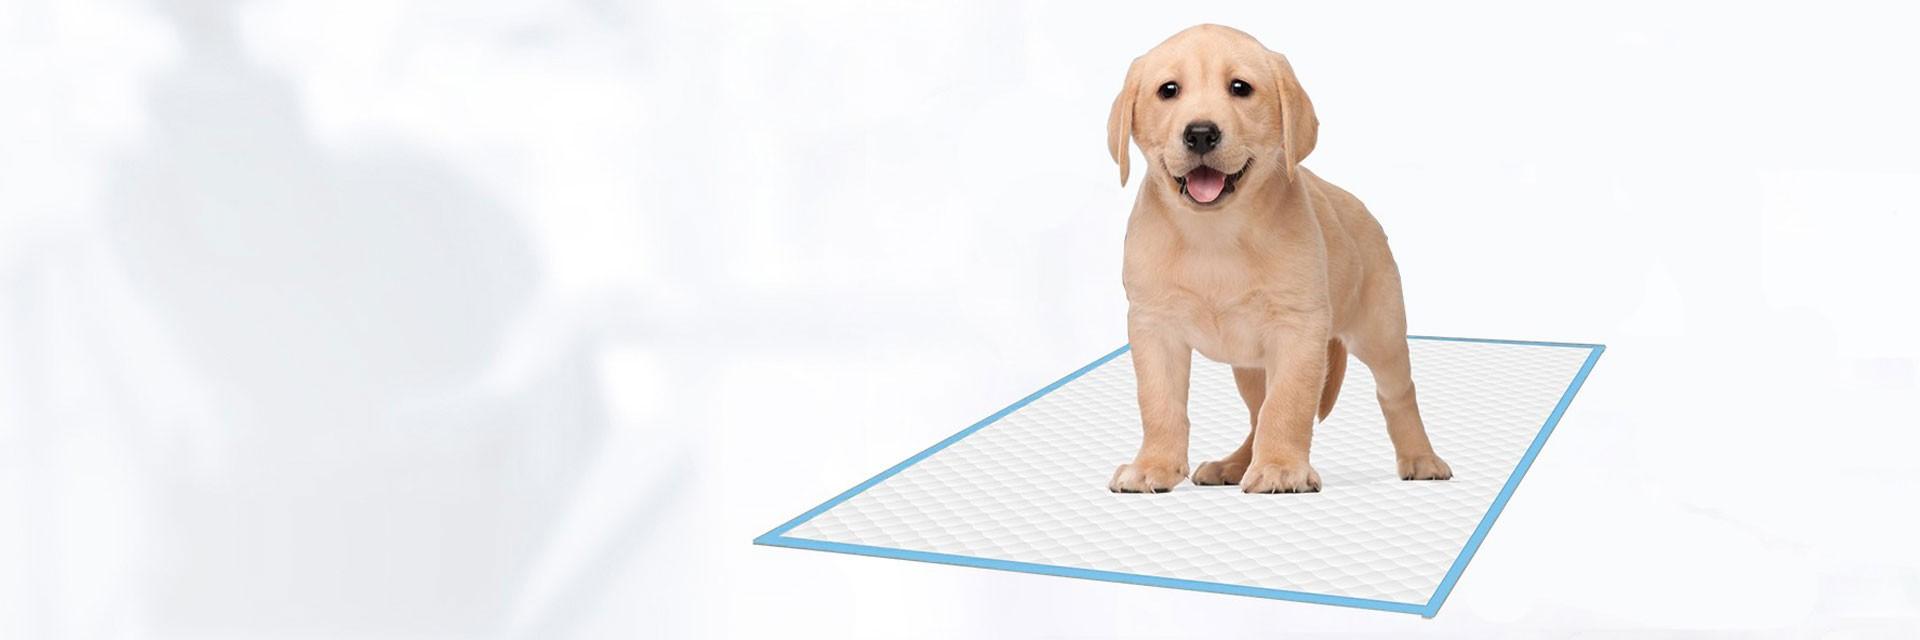 Pet Pads Training Pads Pee Pads